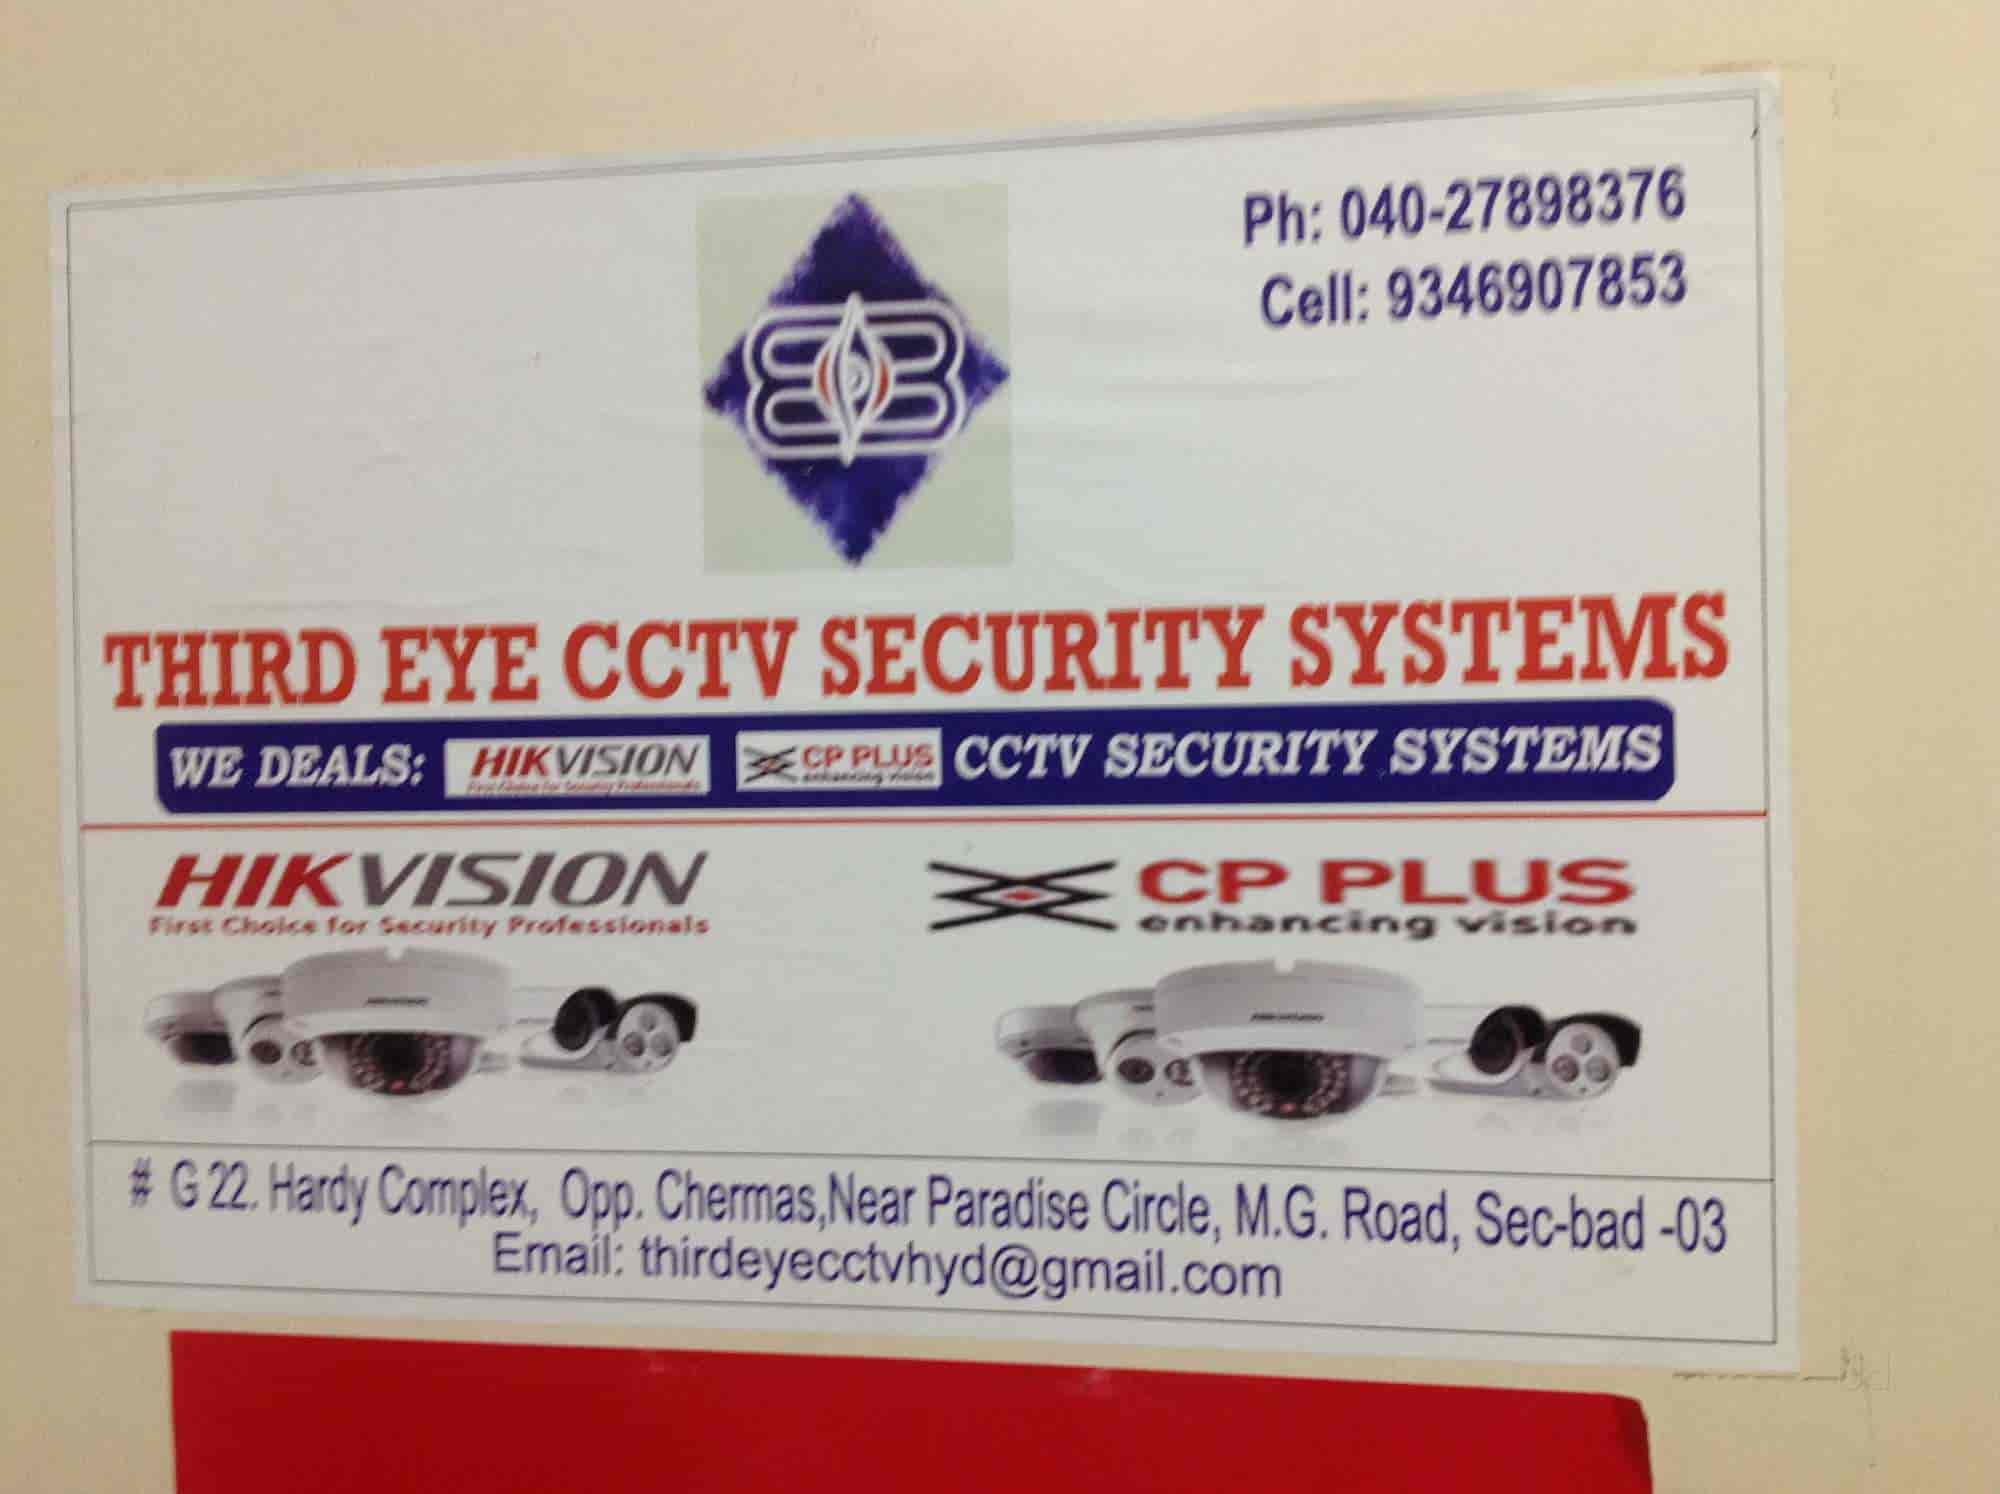 Third Eye Ccctv Security Systems Photos Secunderabad Karimnagar